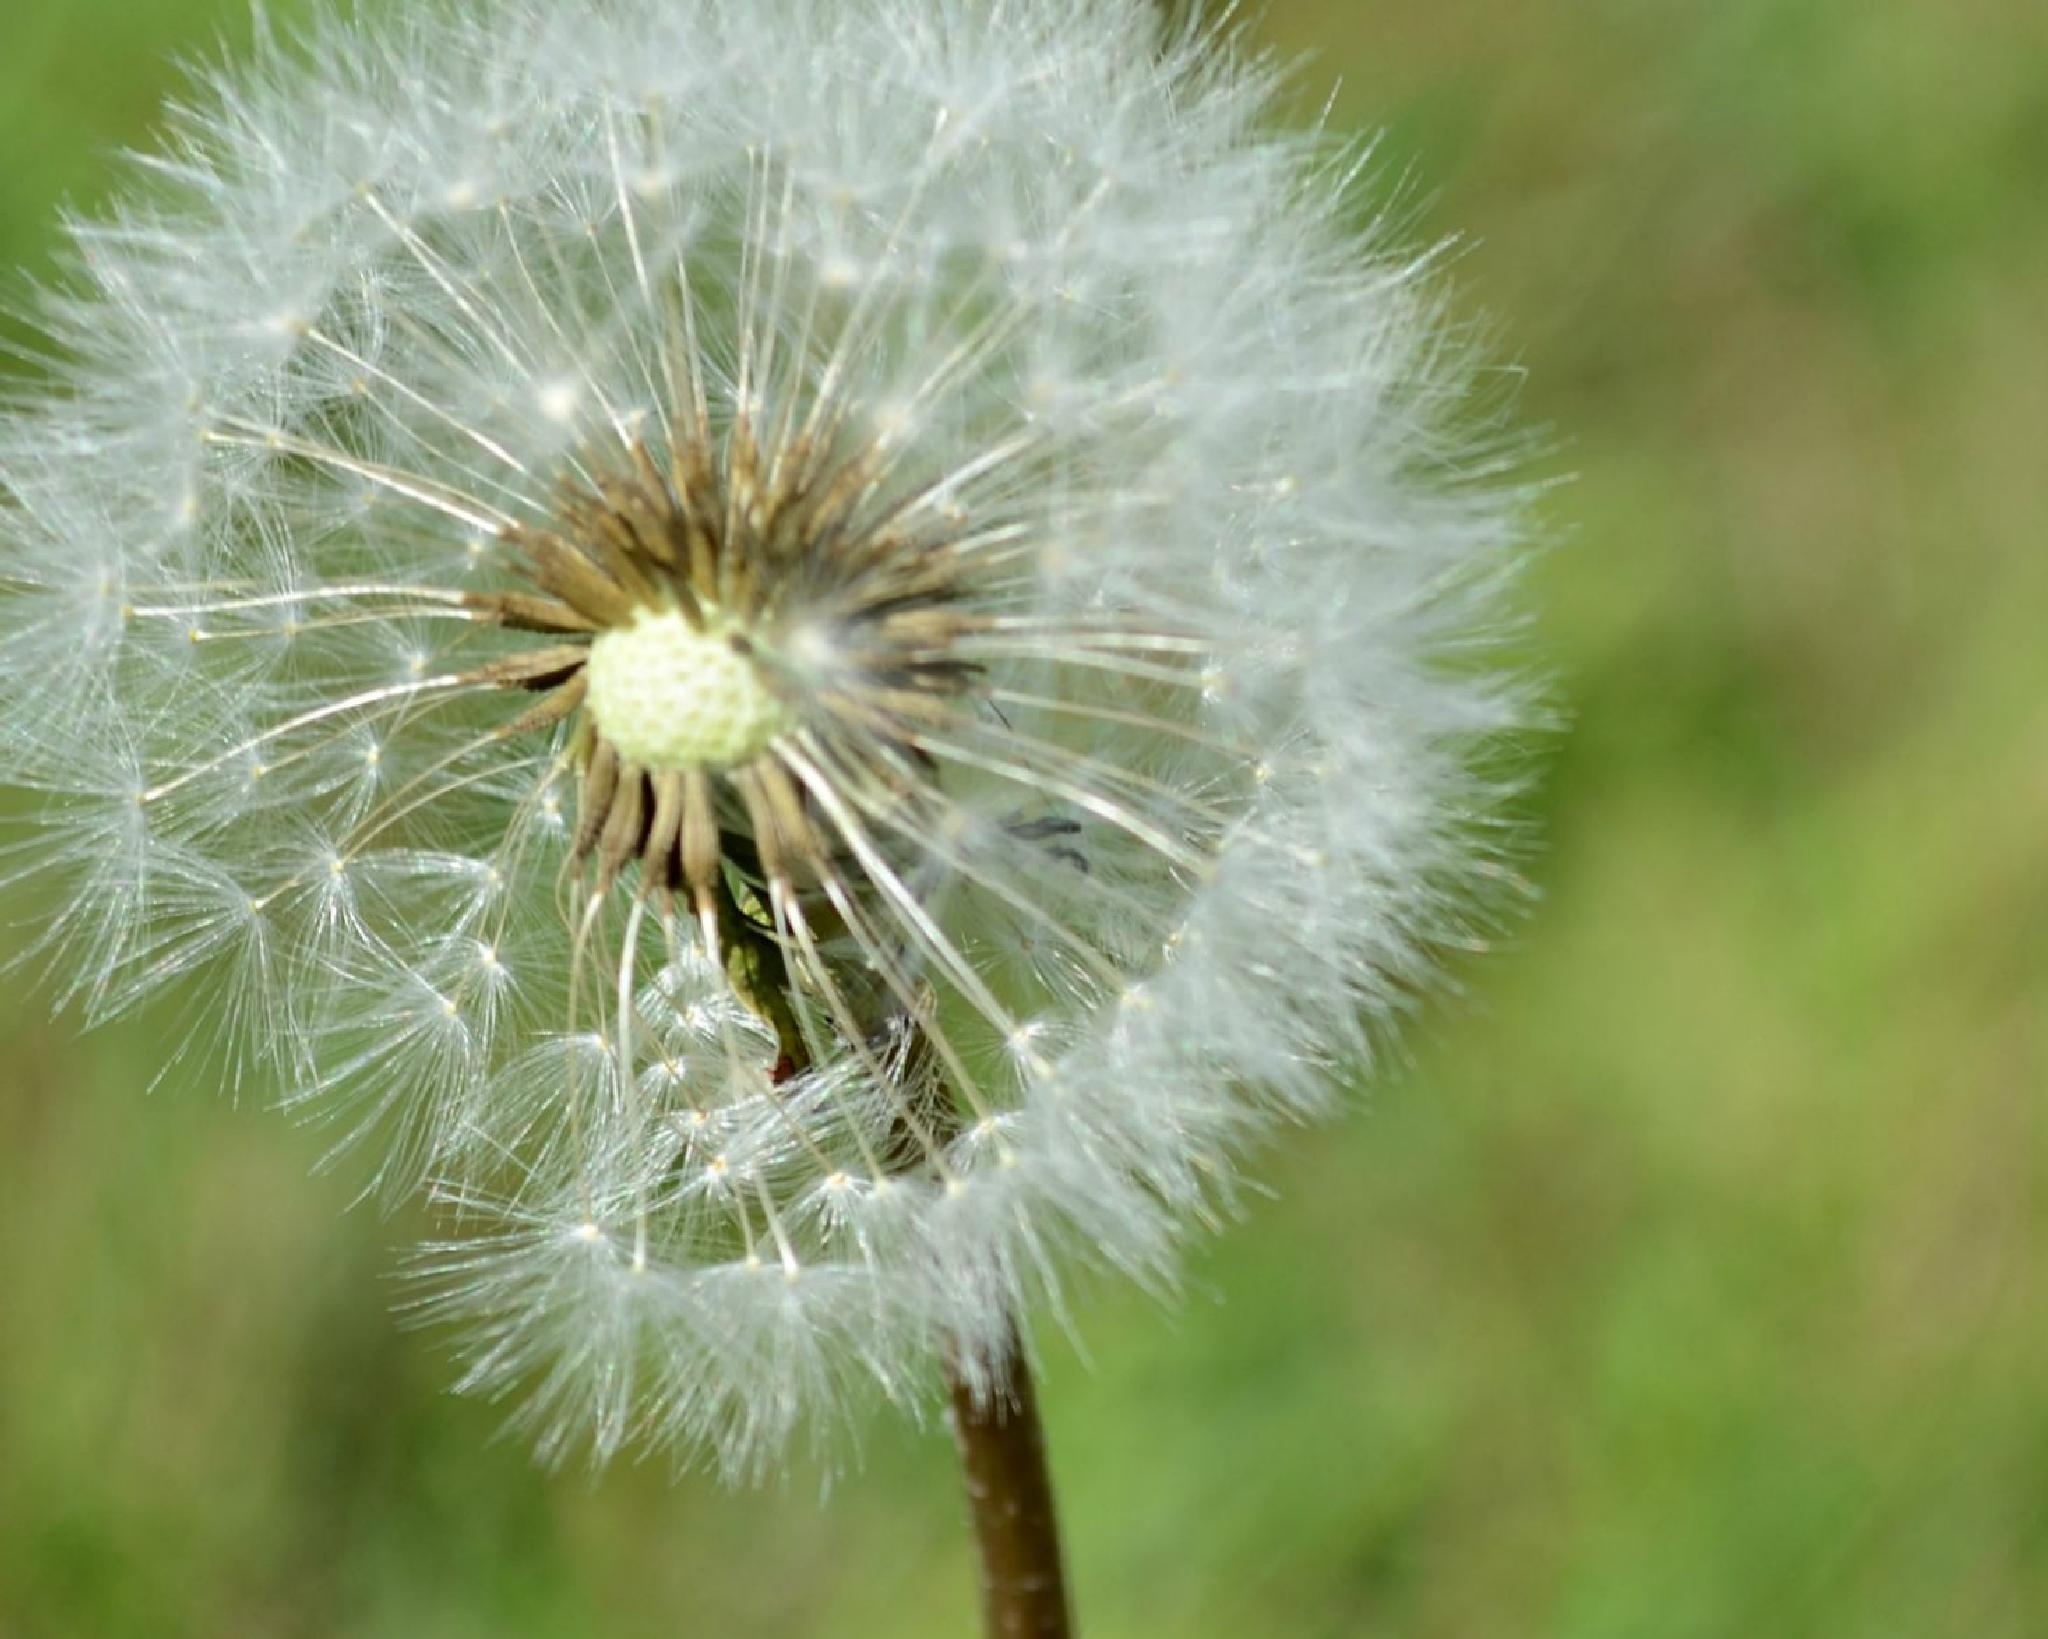 make a wish by Tiffany Lea Ayotte